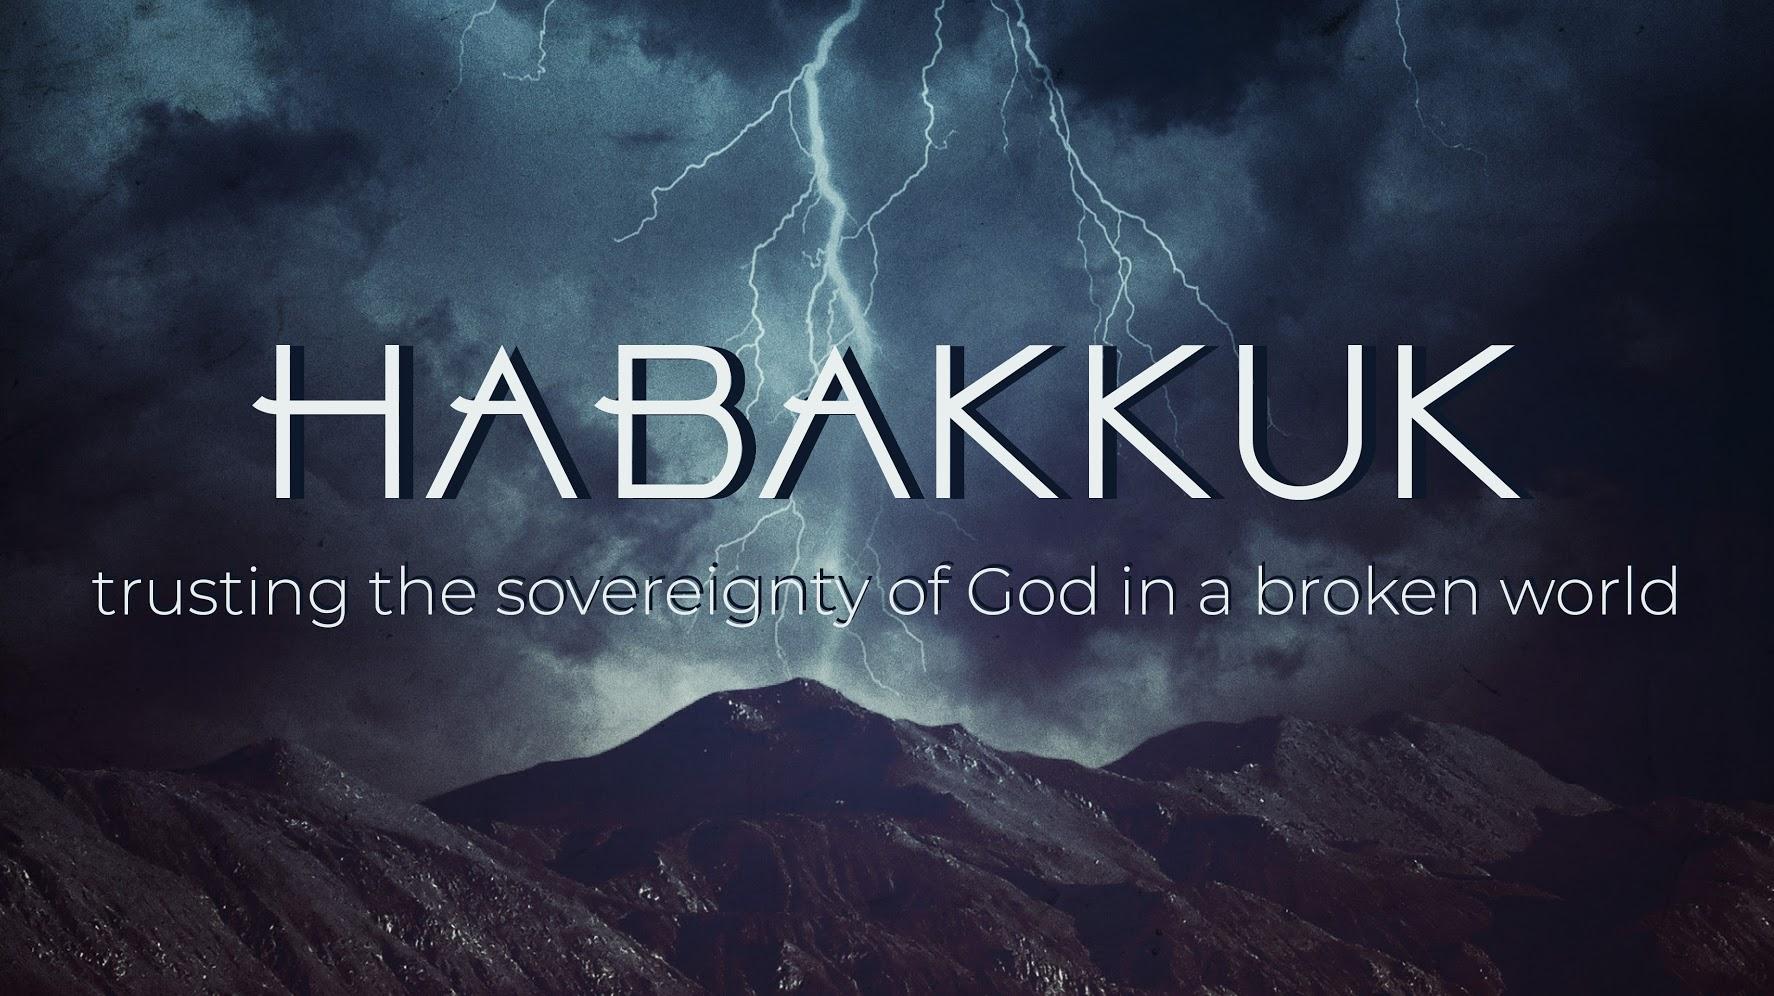 Habakkuk - Trusting the Sovereignty of God in a Broken World   Study Guide